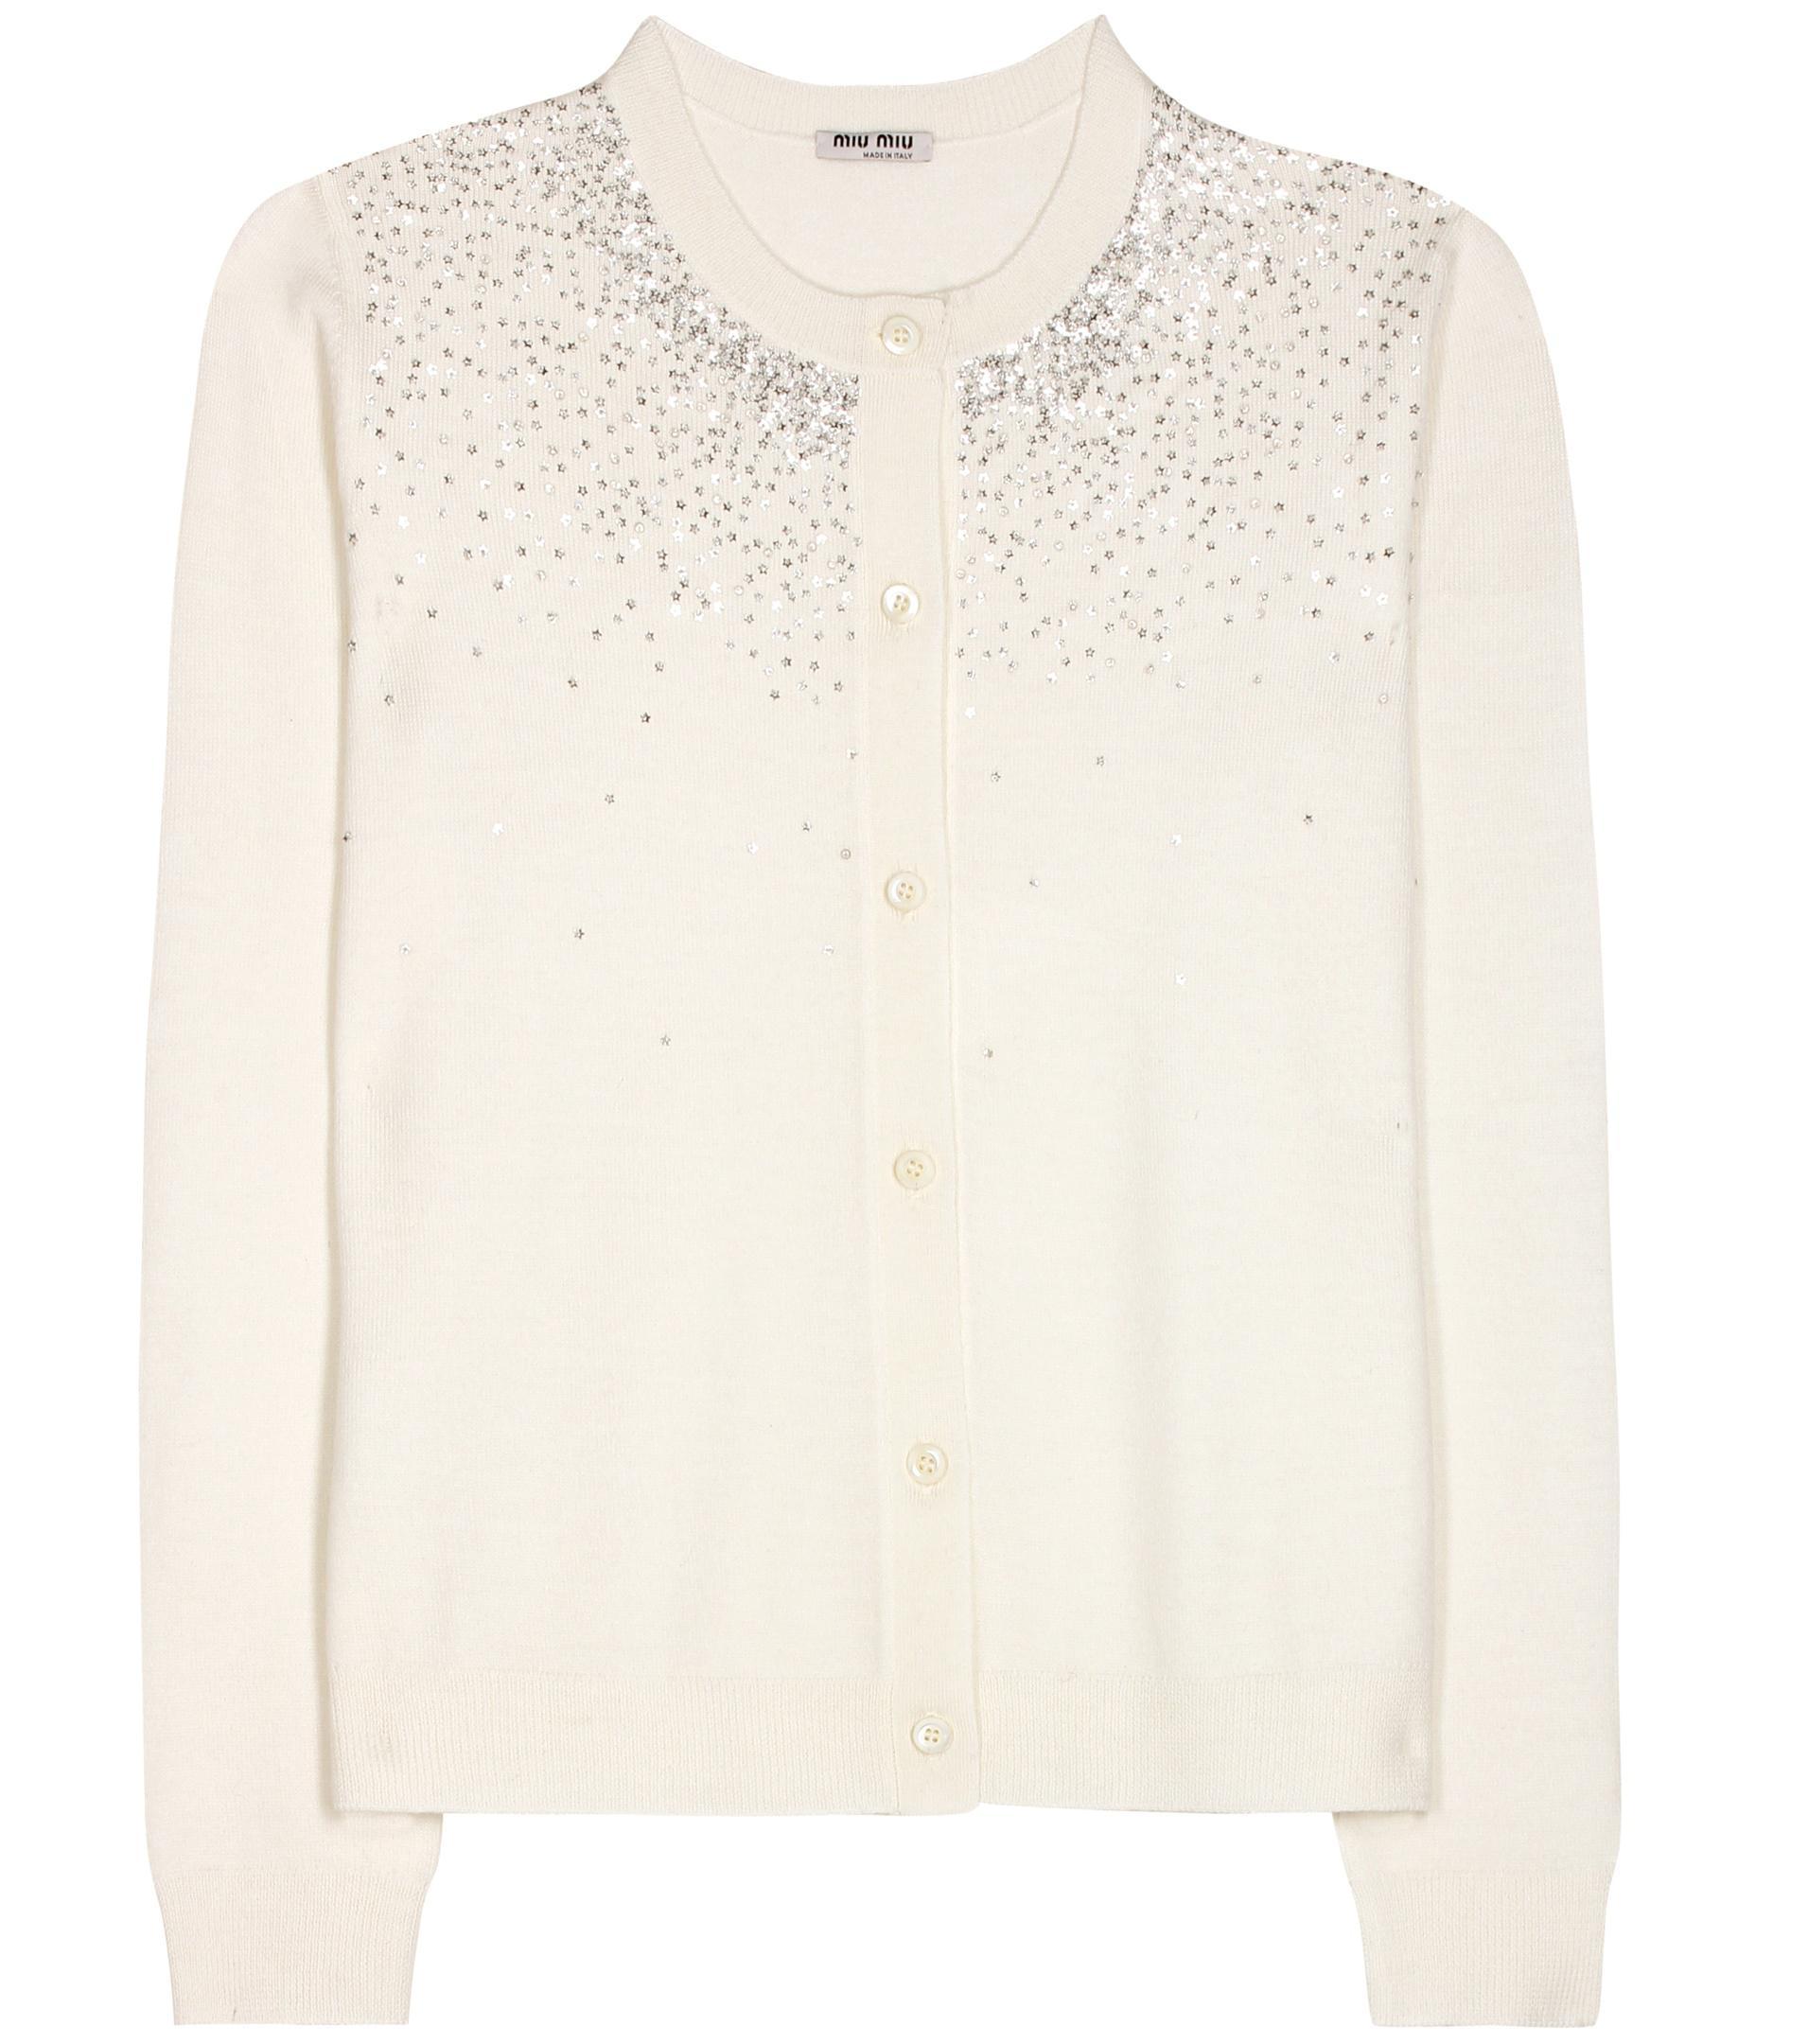 Miu miu Sequin-embellished Wool Cardigan in White | Lyst